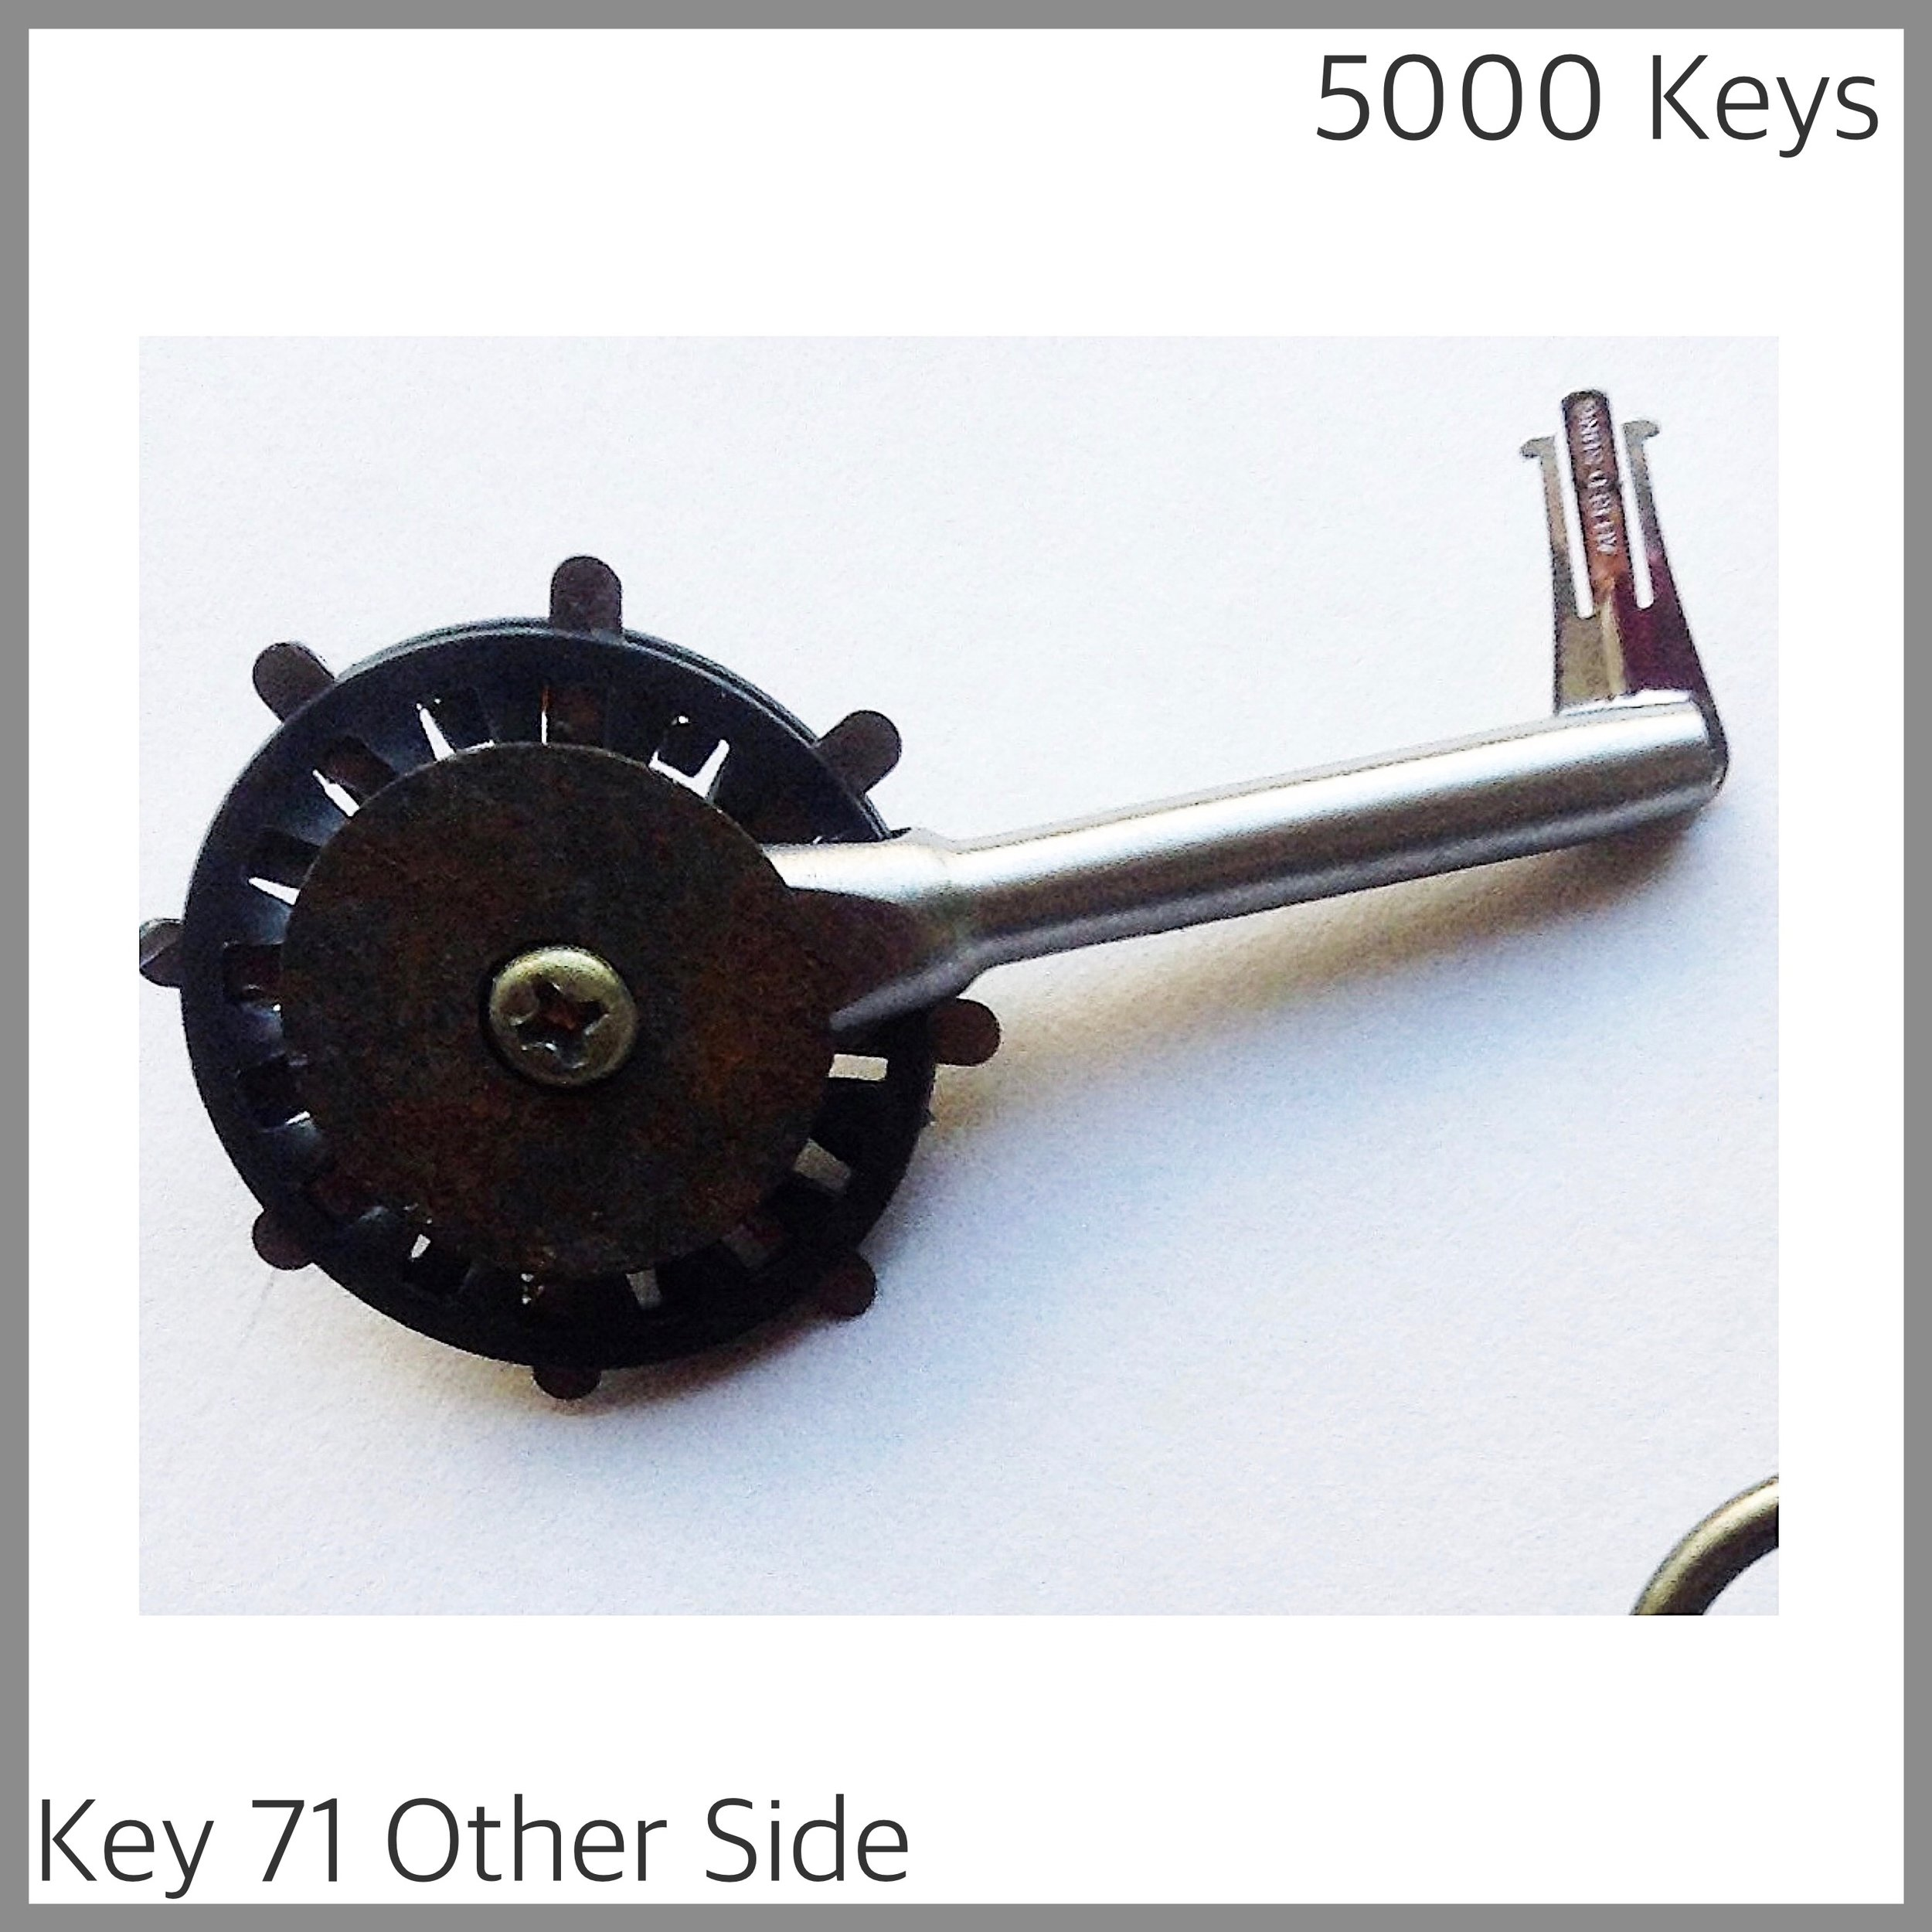 Key 71 other side - 1.JPG